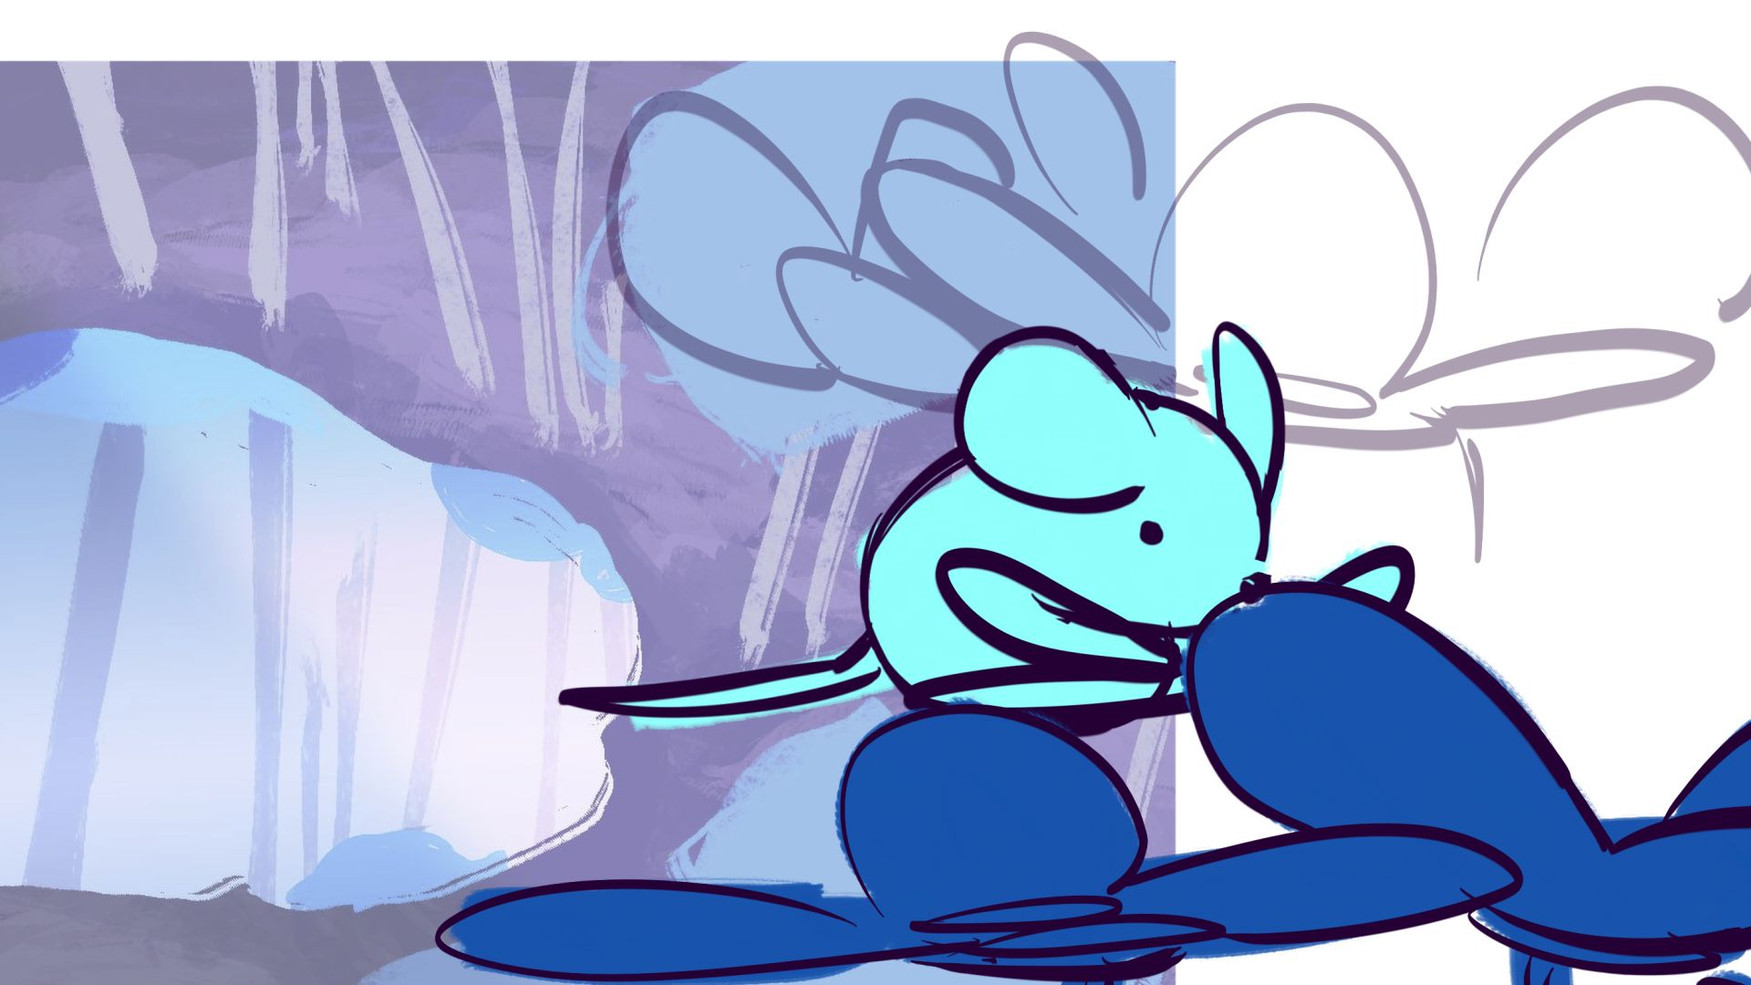 MouseBoards00023.jpg